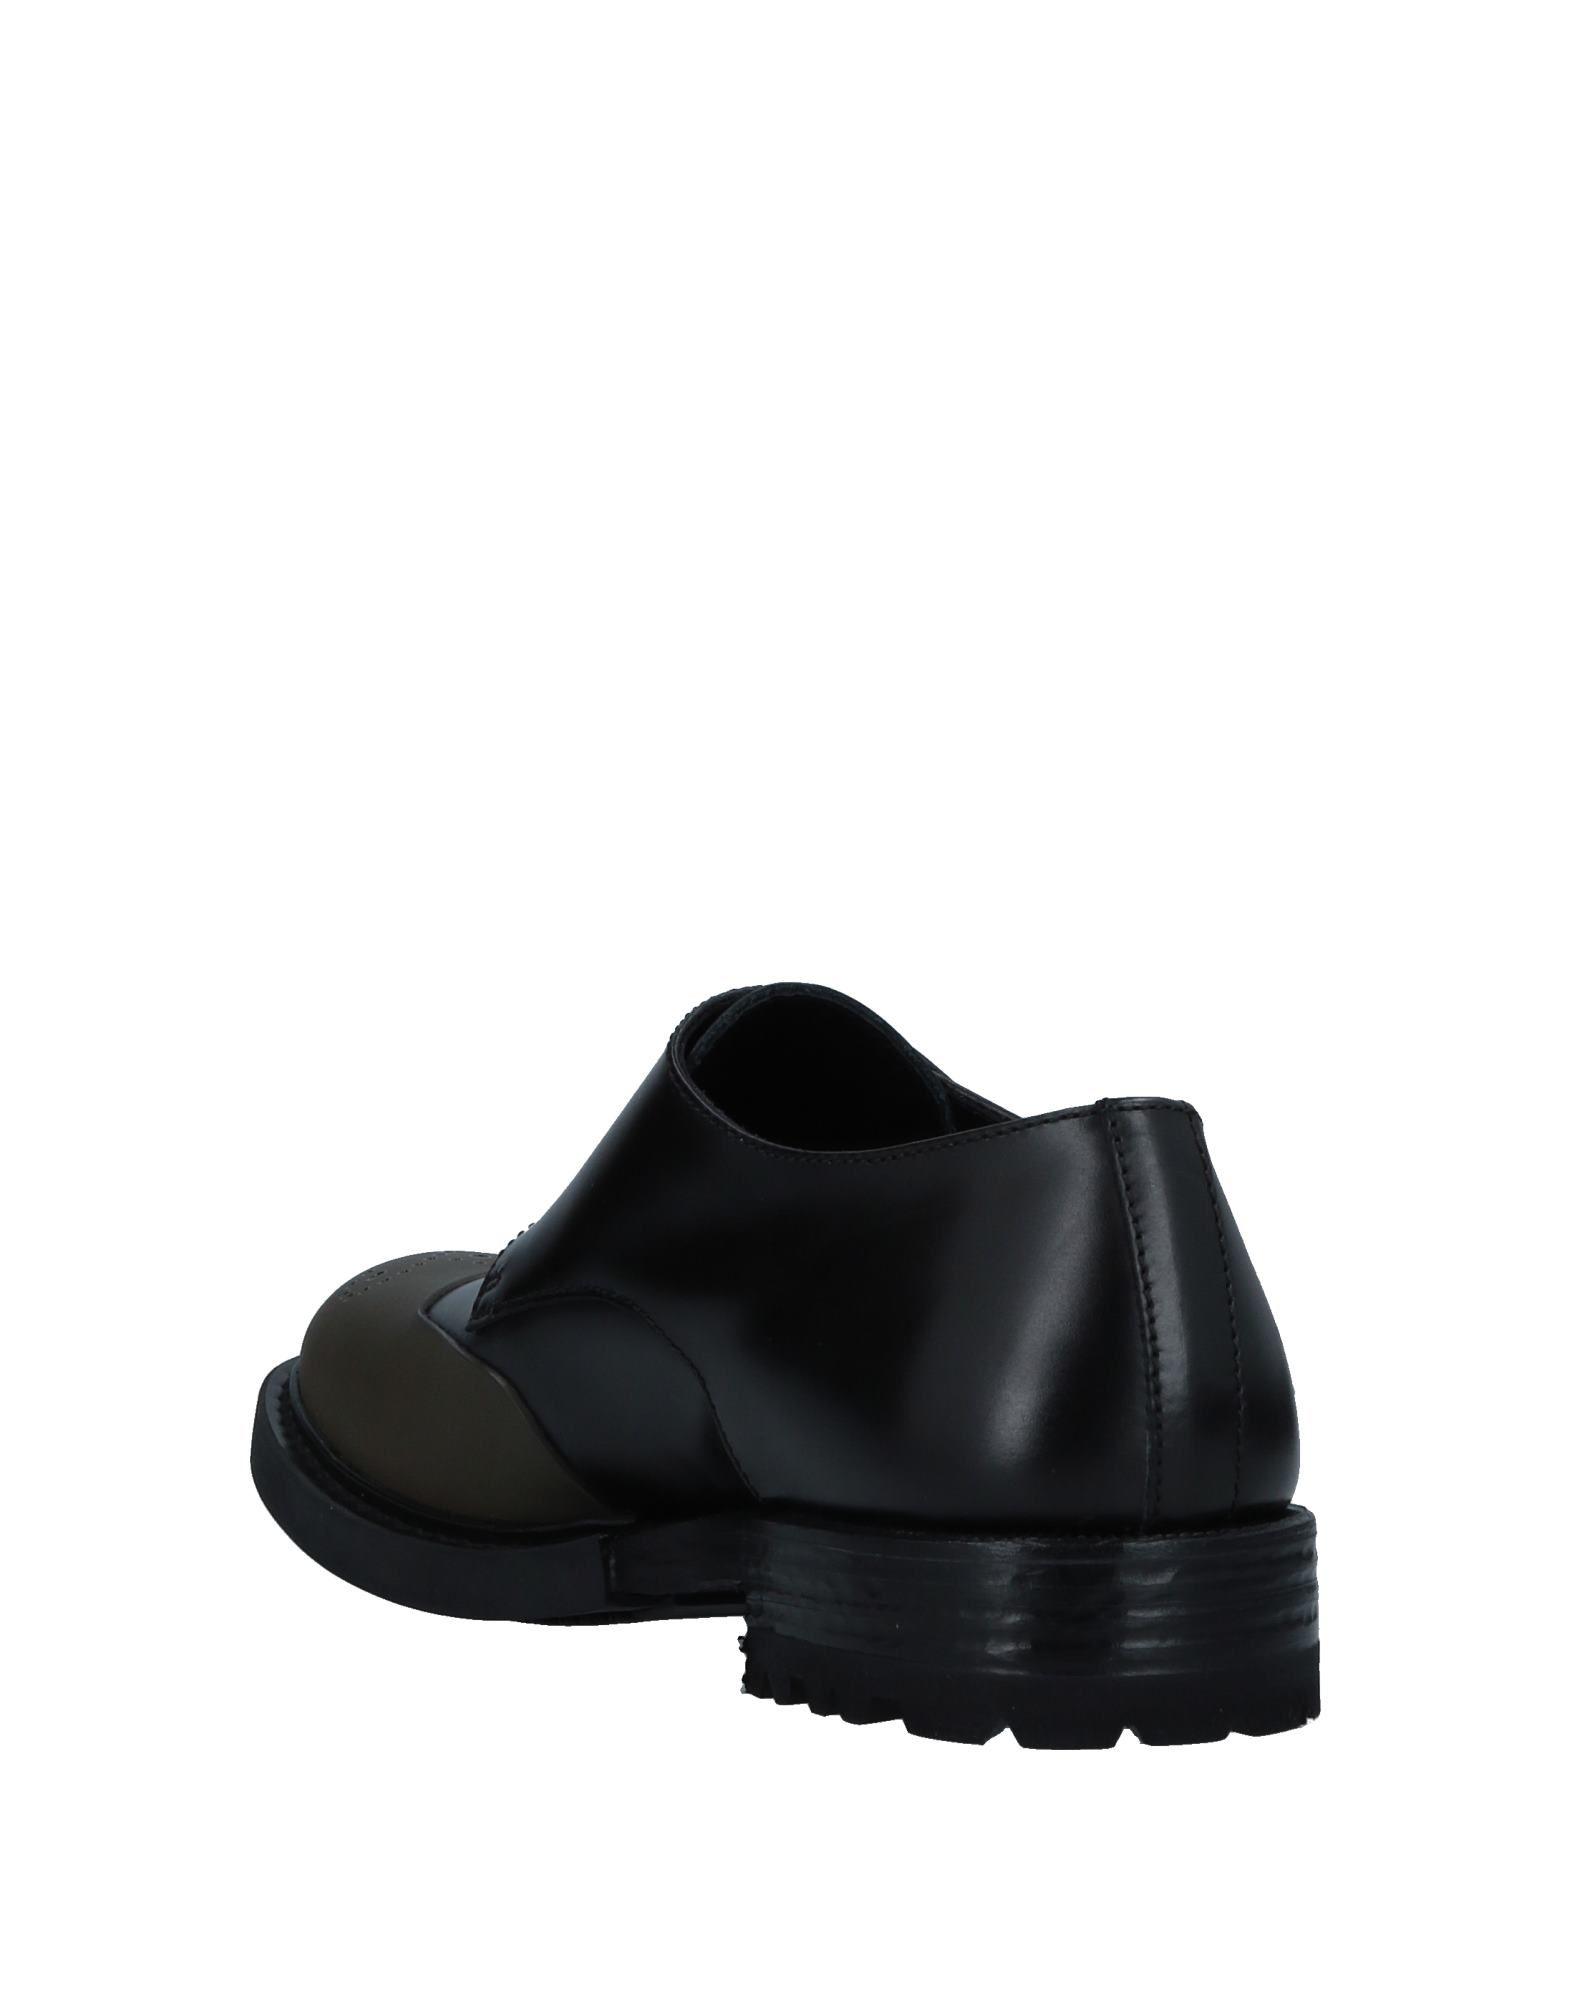 Barracuda Mokassins Herren  Schuhe 11532147FE Gute Qualität beliebte Schuhe  5af757